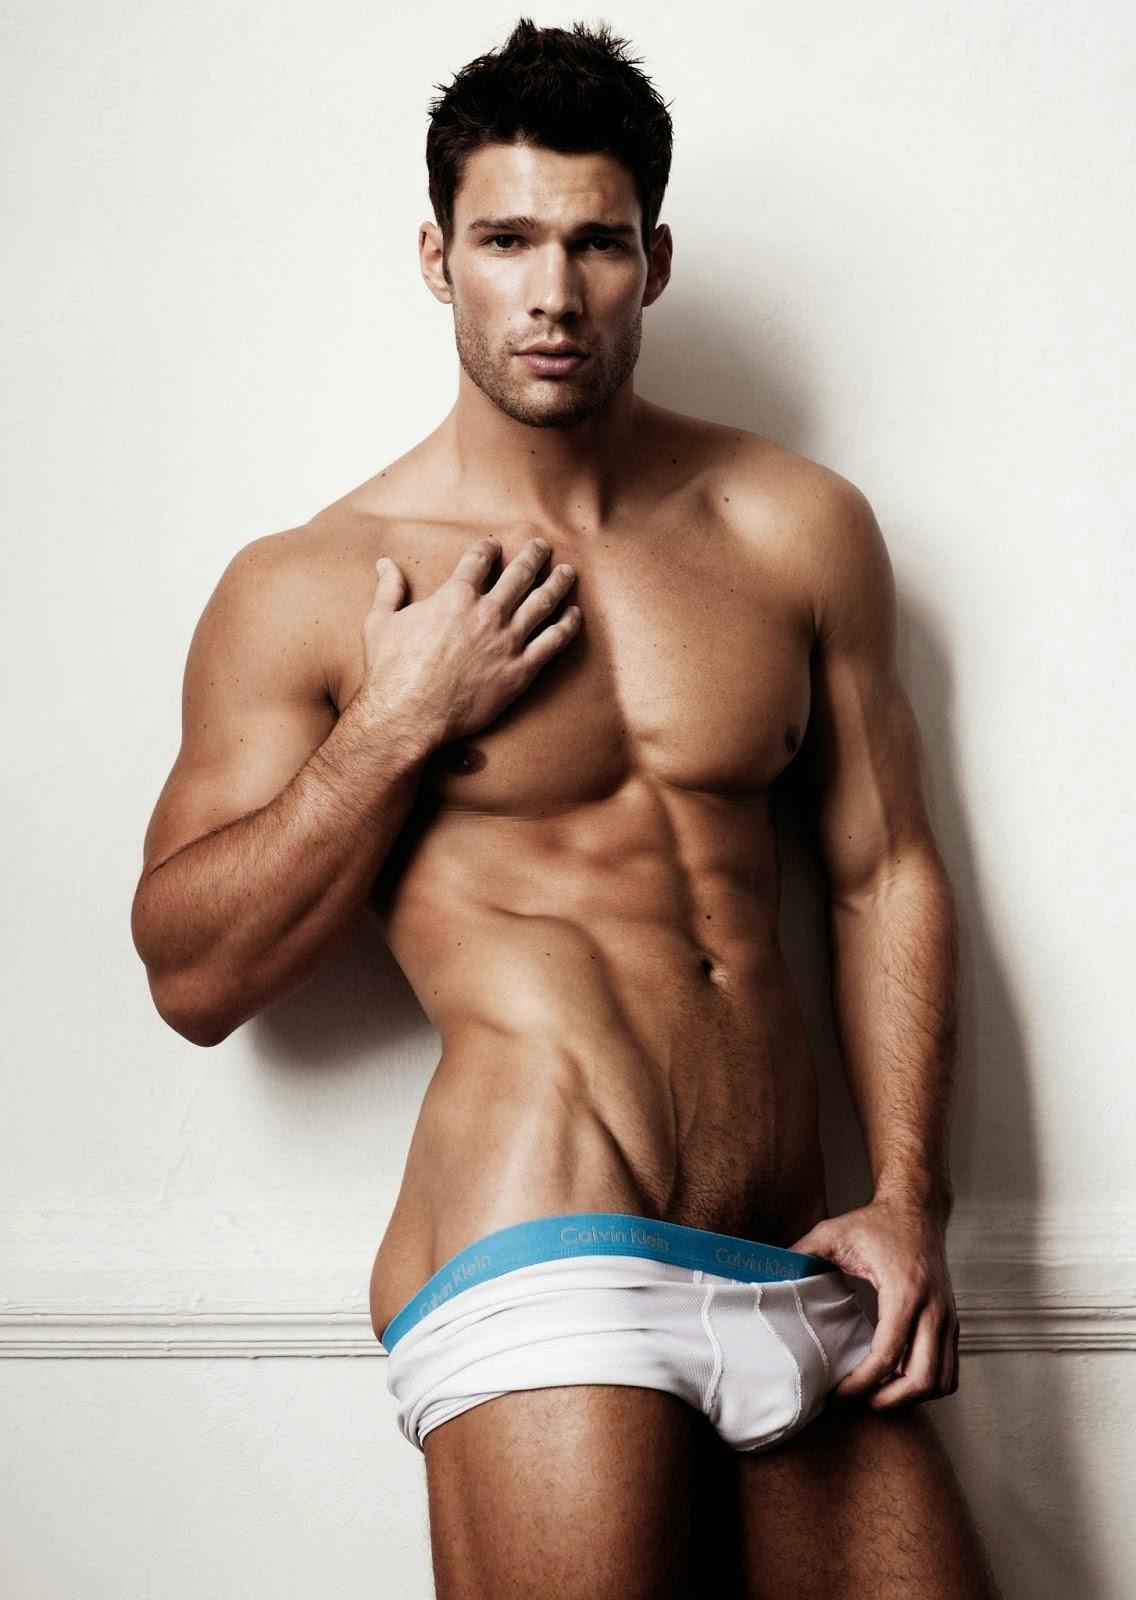 Naked Beautiful Young Men